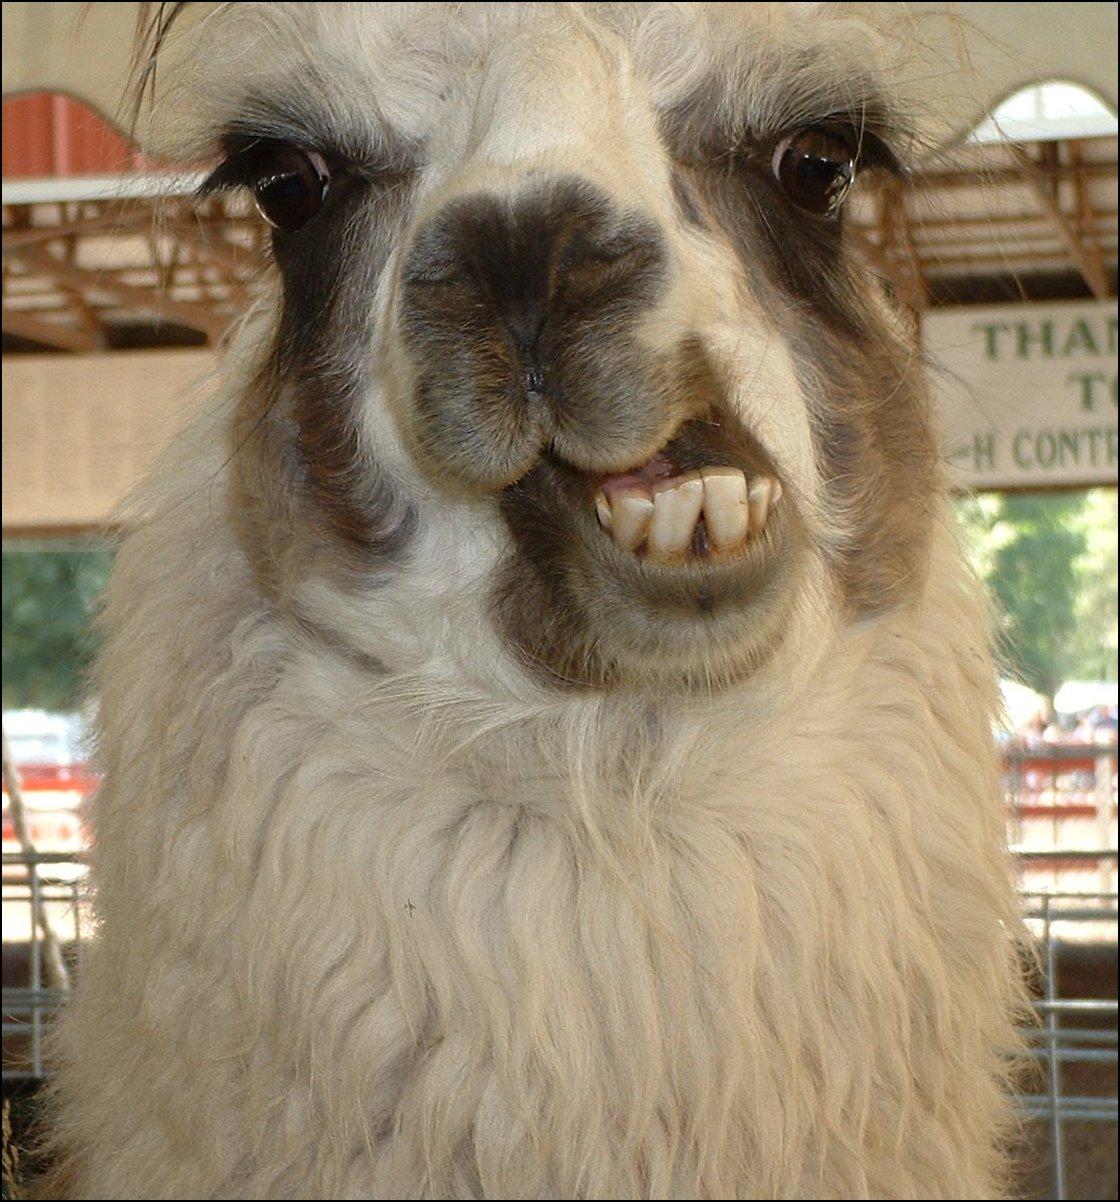 Mentally Retarded Llama